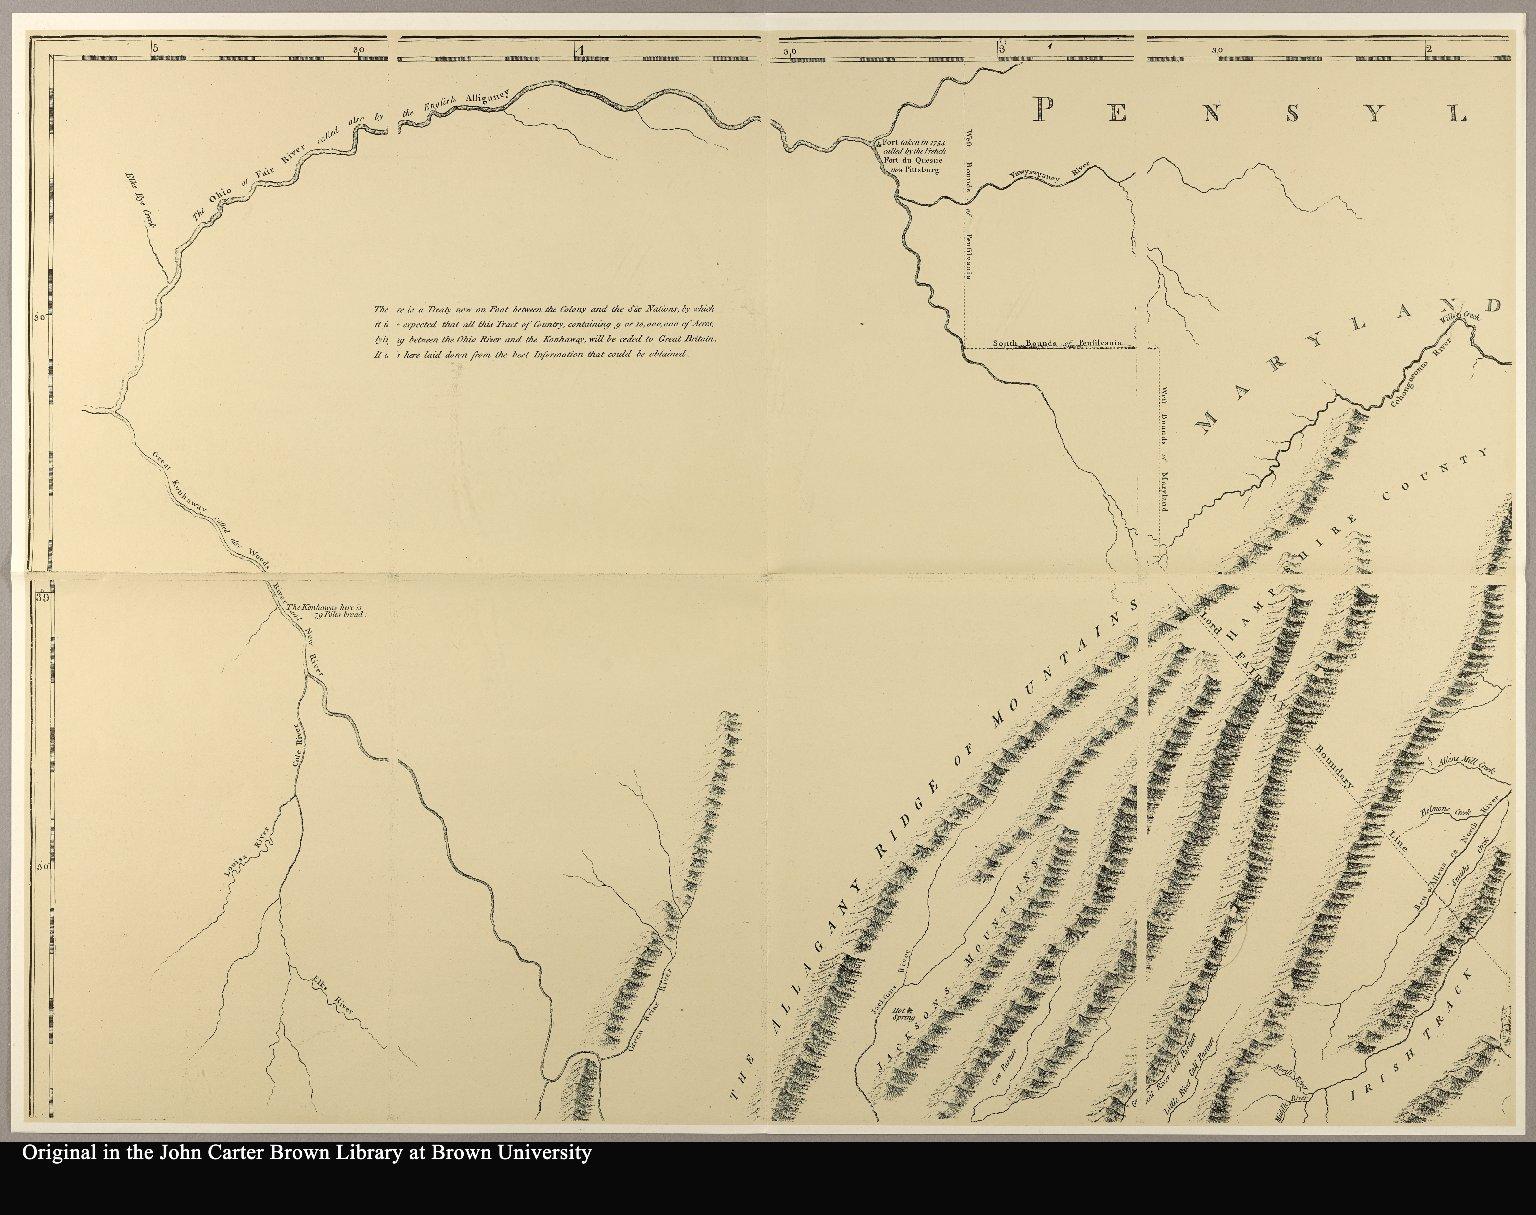 [upper left] map of Virginia